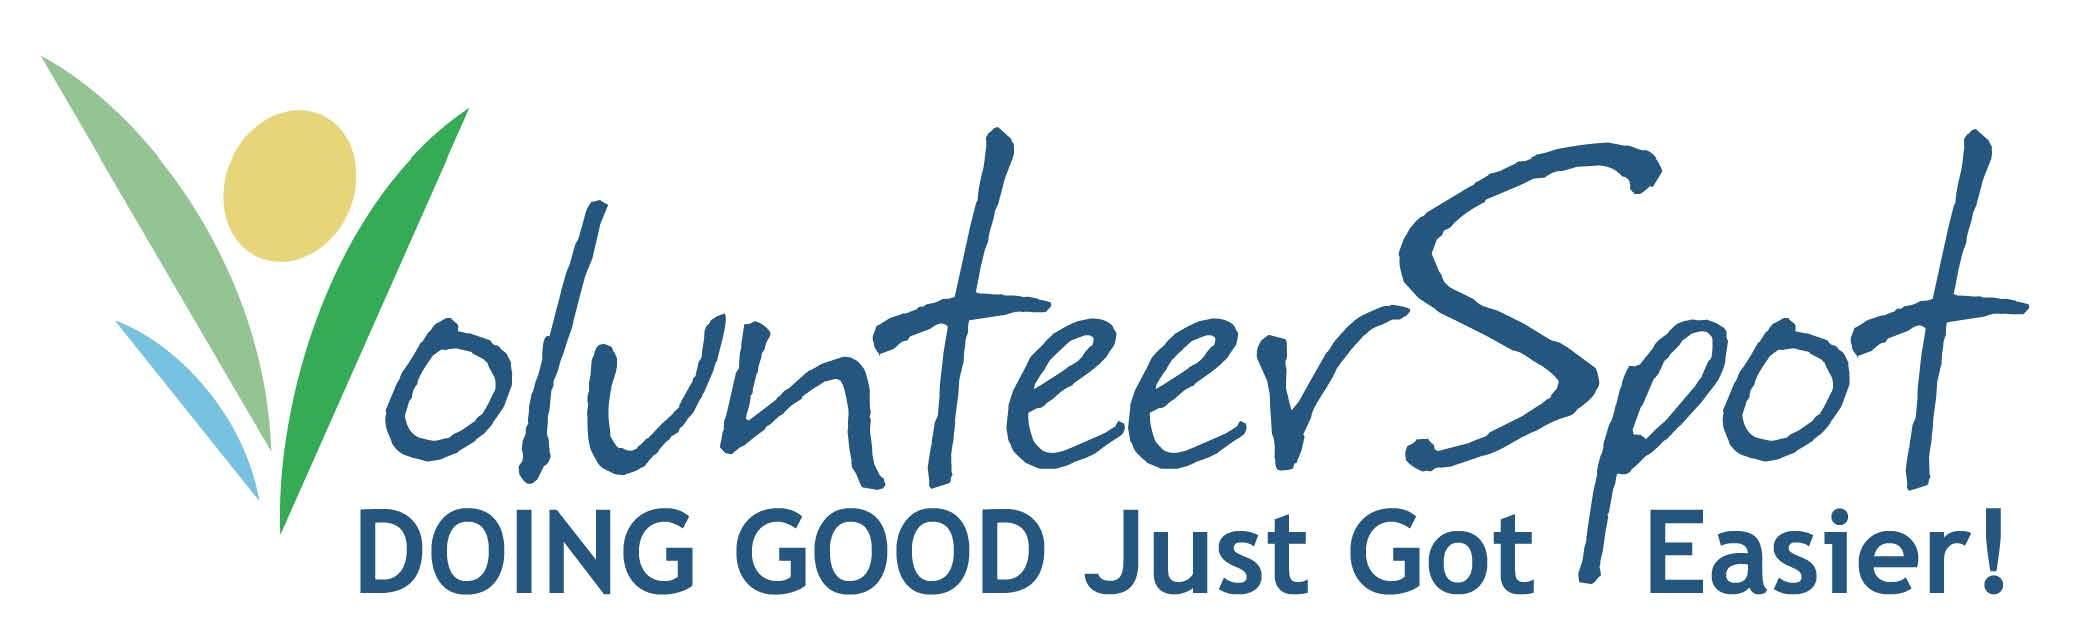 volunteerspot.com logo